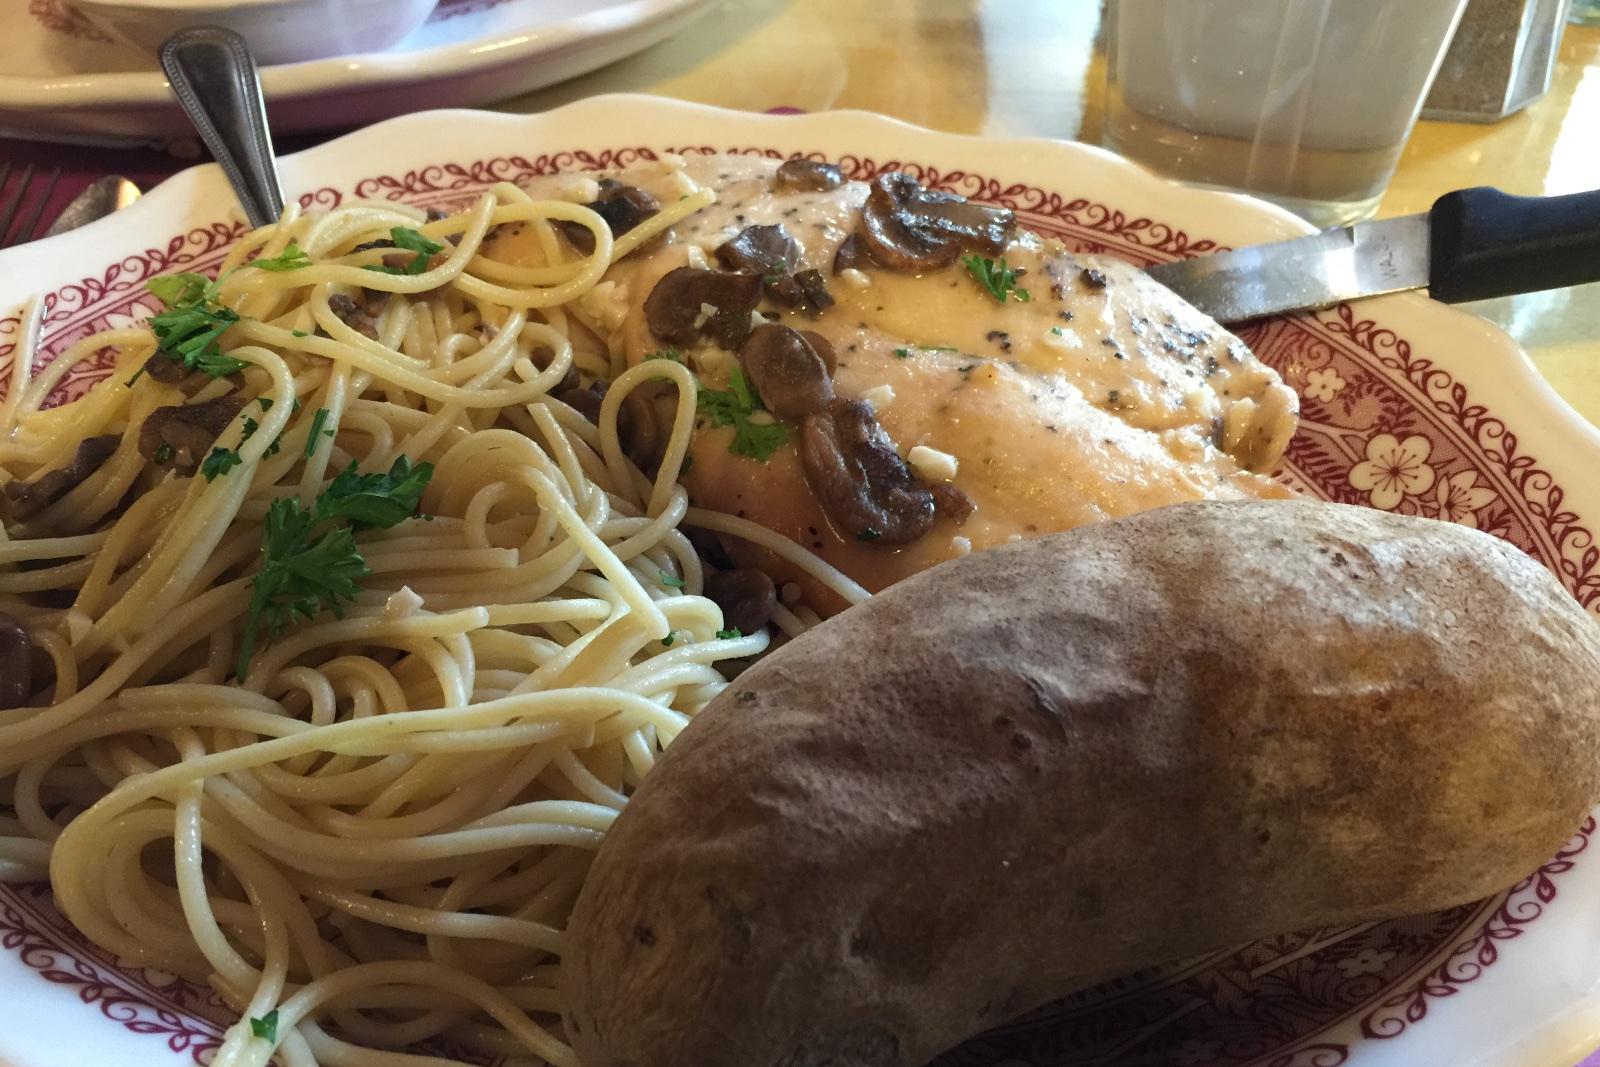 http://blog.rickk.com/food/2015/03/18/ate.2015.03.18.d2.jpg